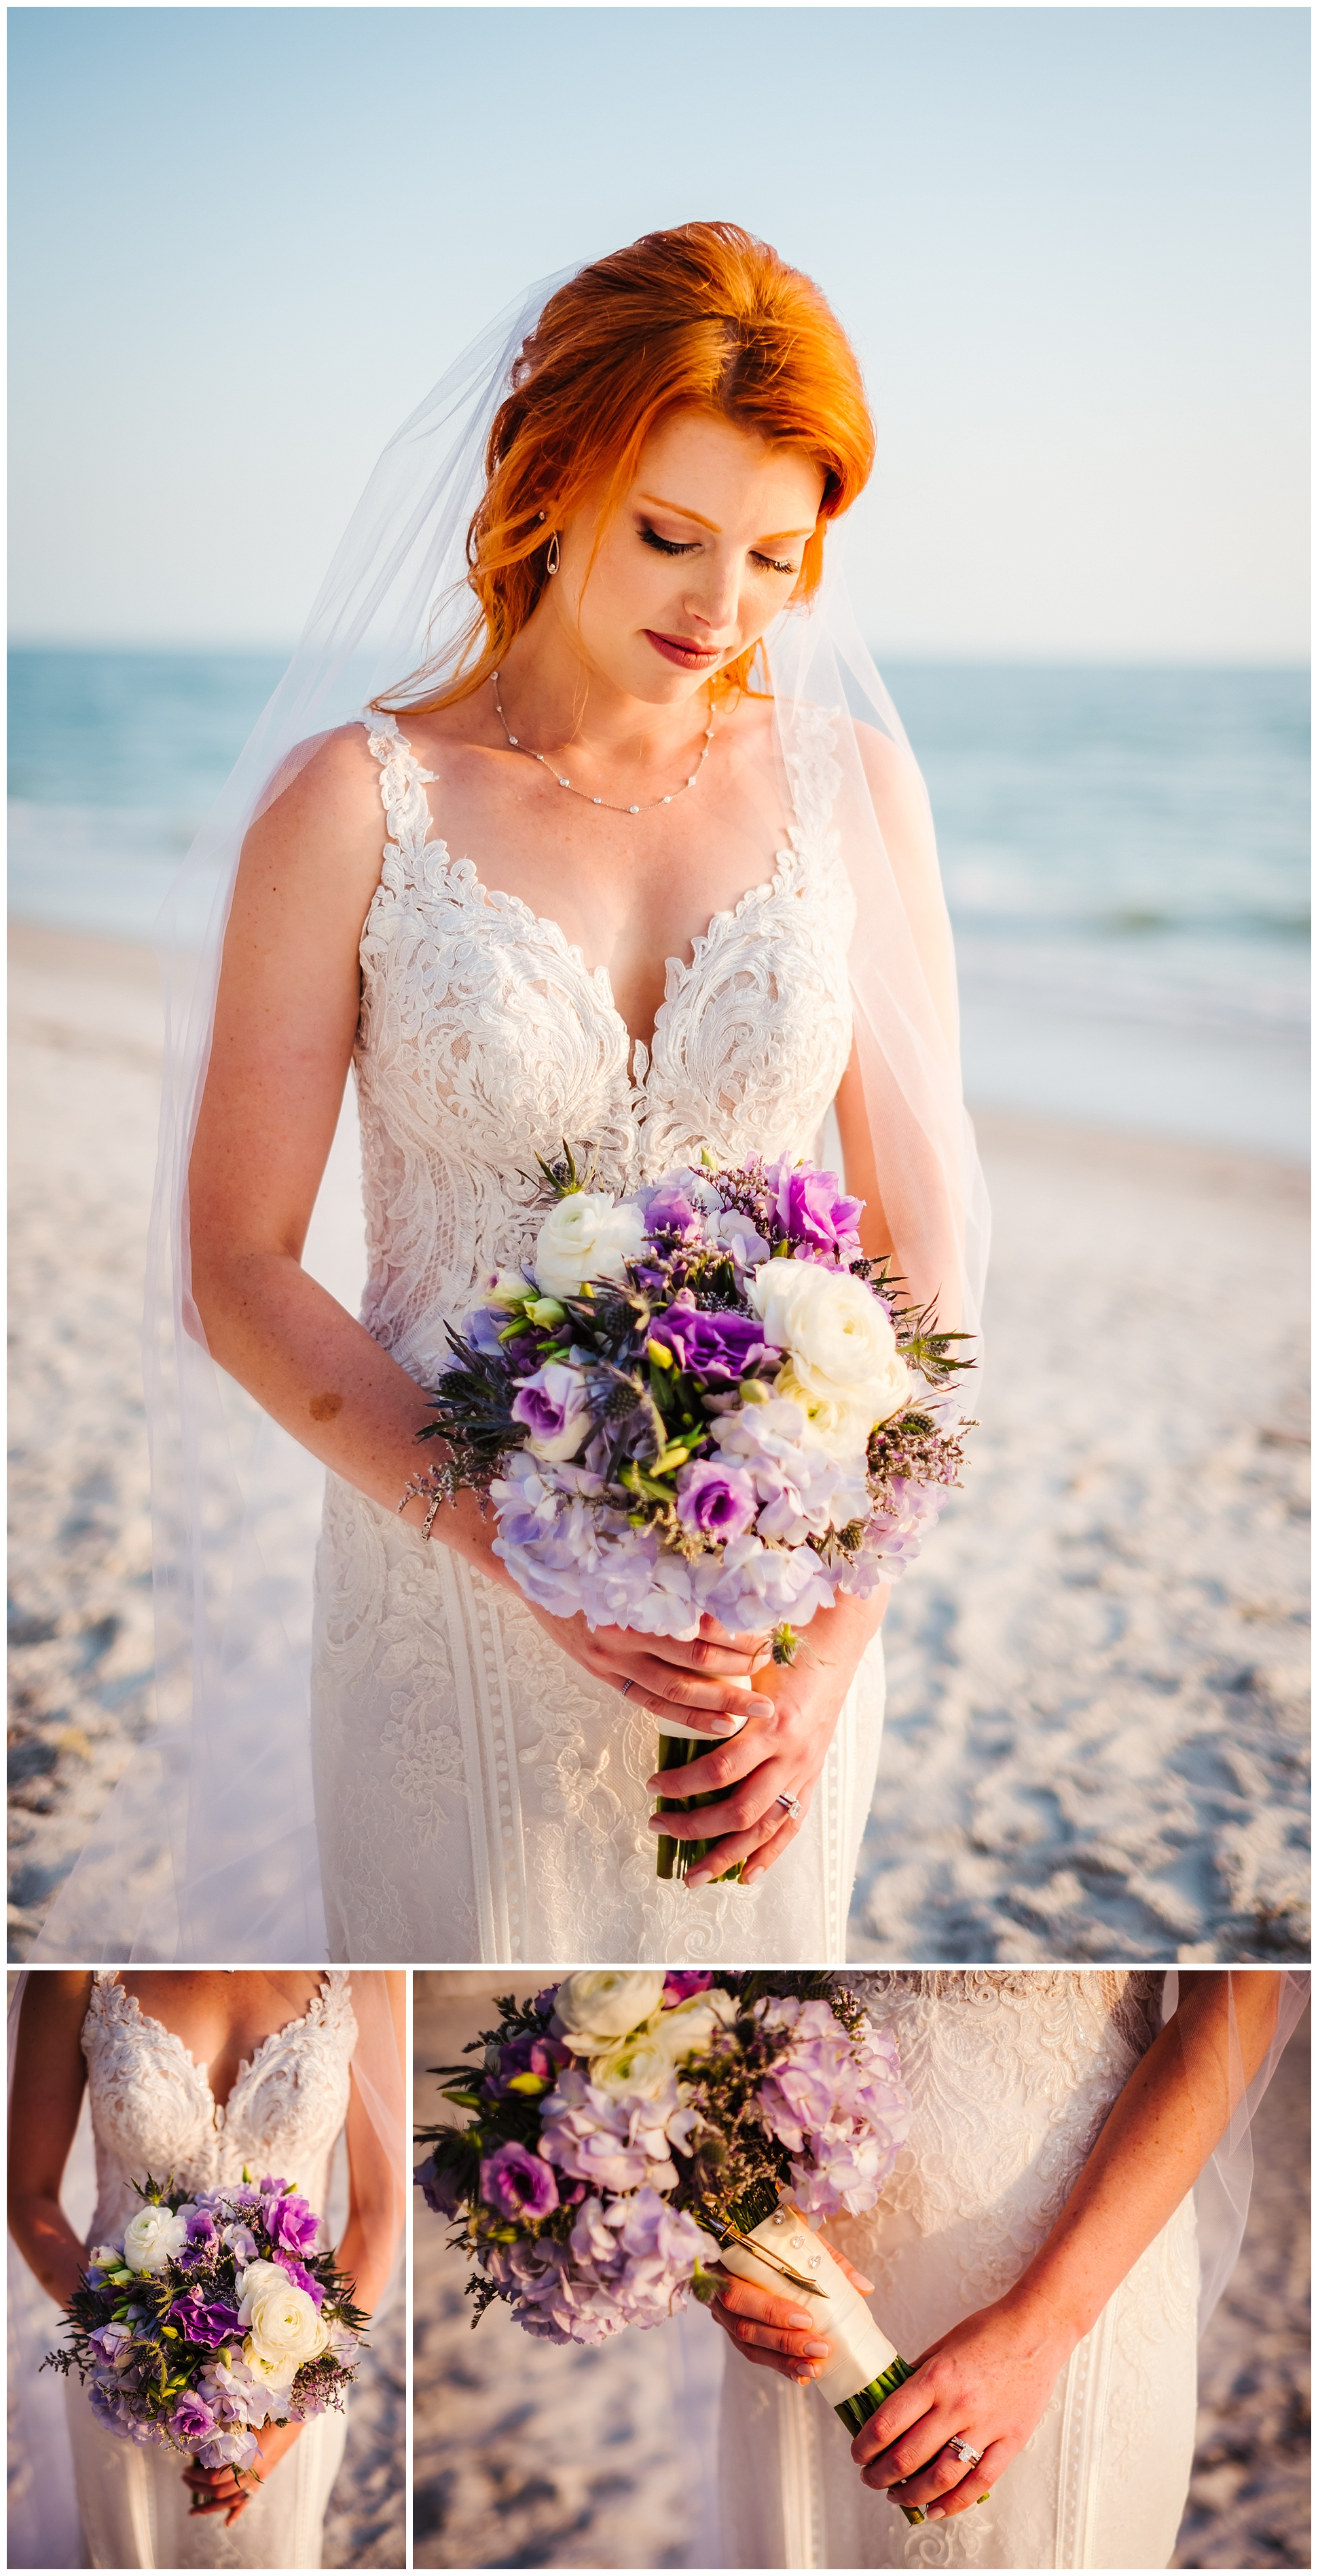 tampa-st-pete-wedding-photographer-indian-rocks-beach-mermaid-train-redhead_0150.jpg